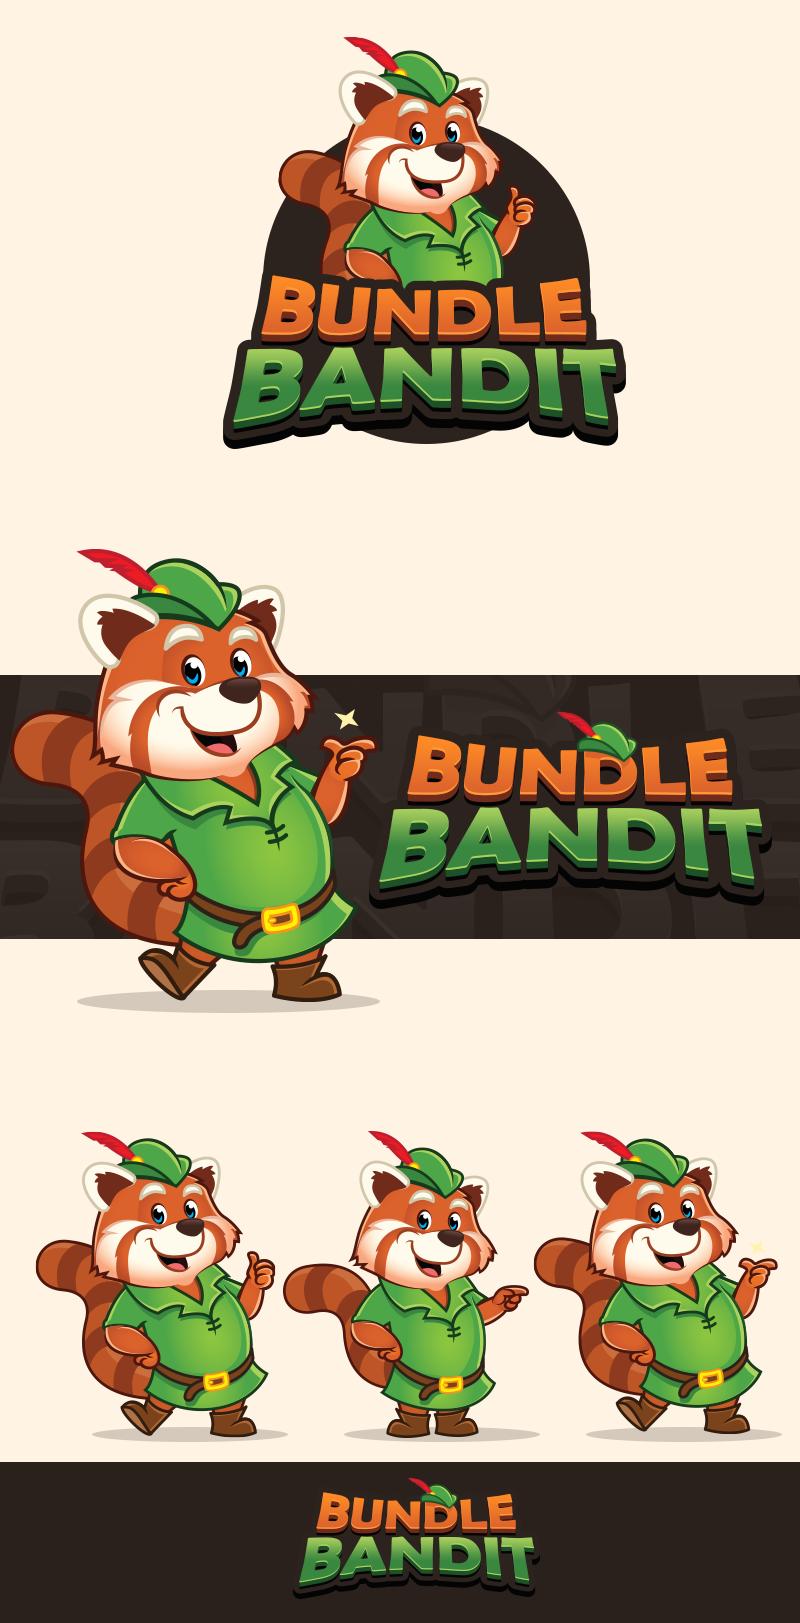 Logo and Mascot for BundleBandit.com